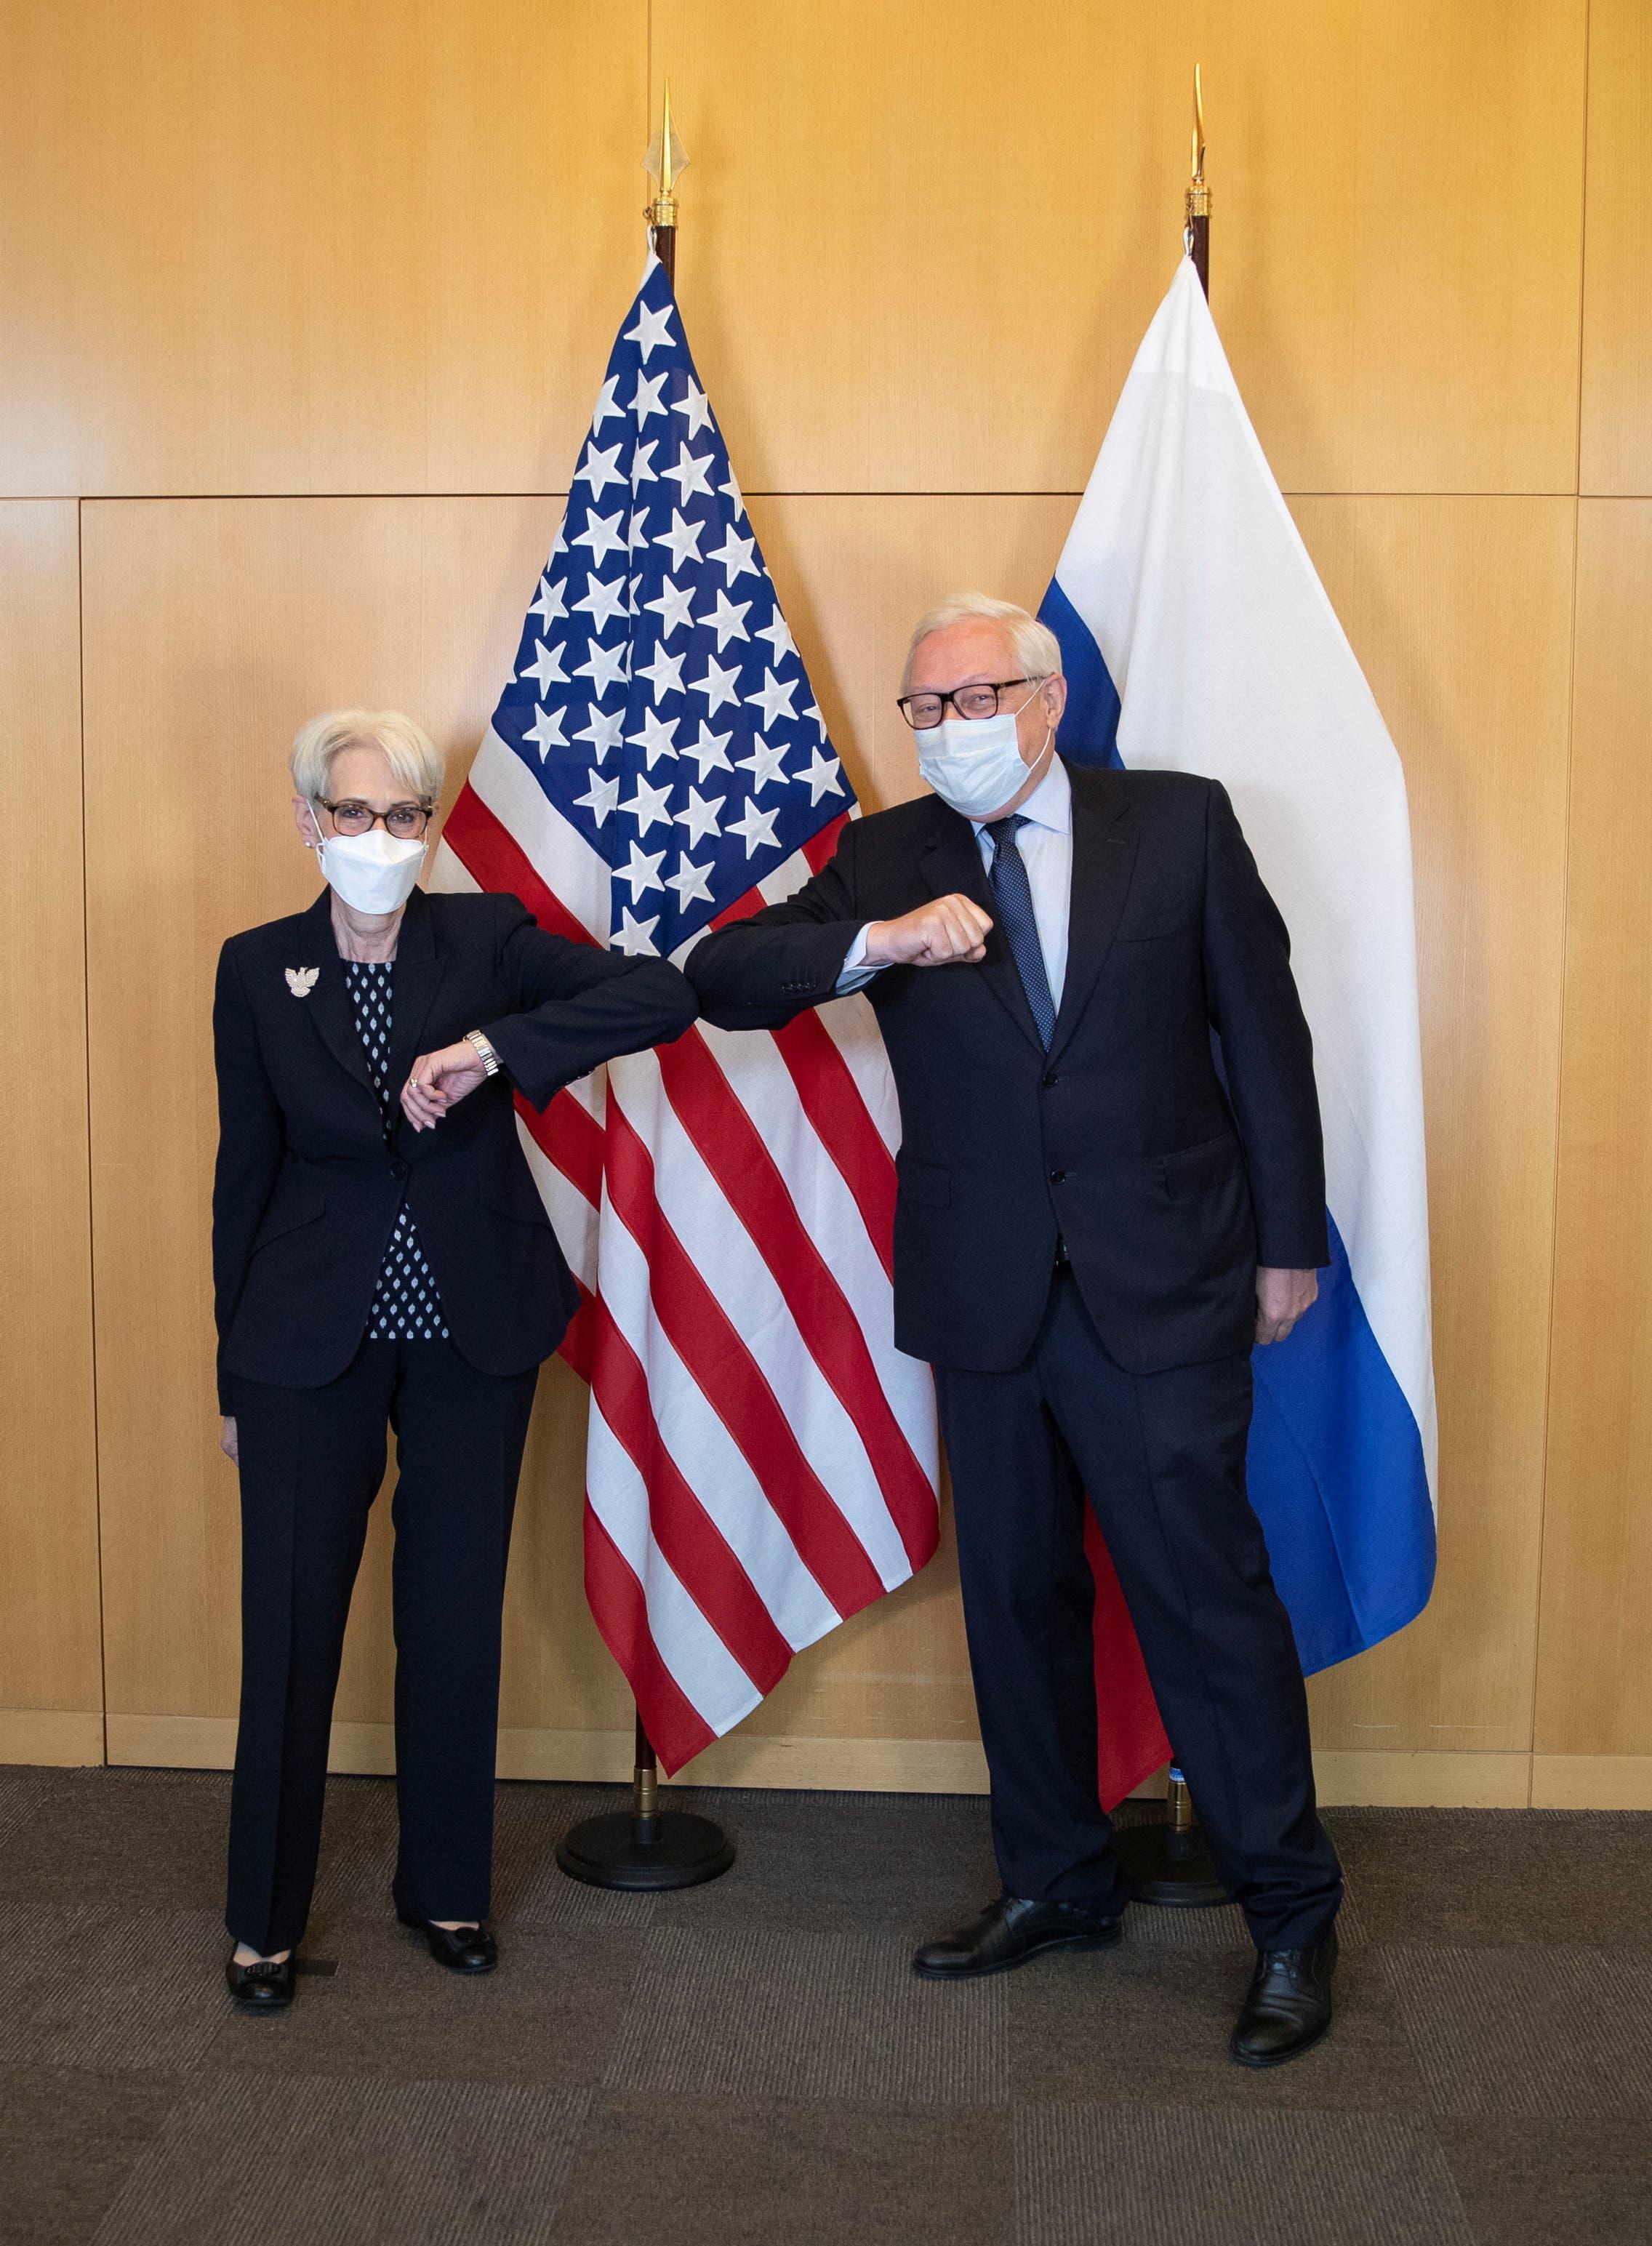 ويندي شيرمان و سيرغي ريابكوف في جنيف يوم 28 يوليو 2021 (رويترز)